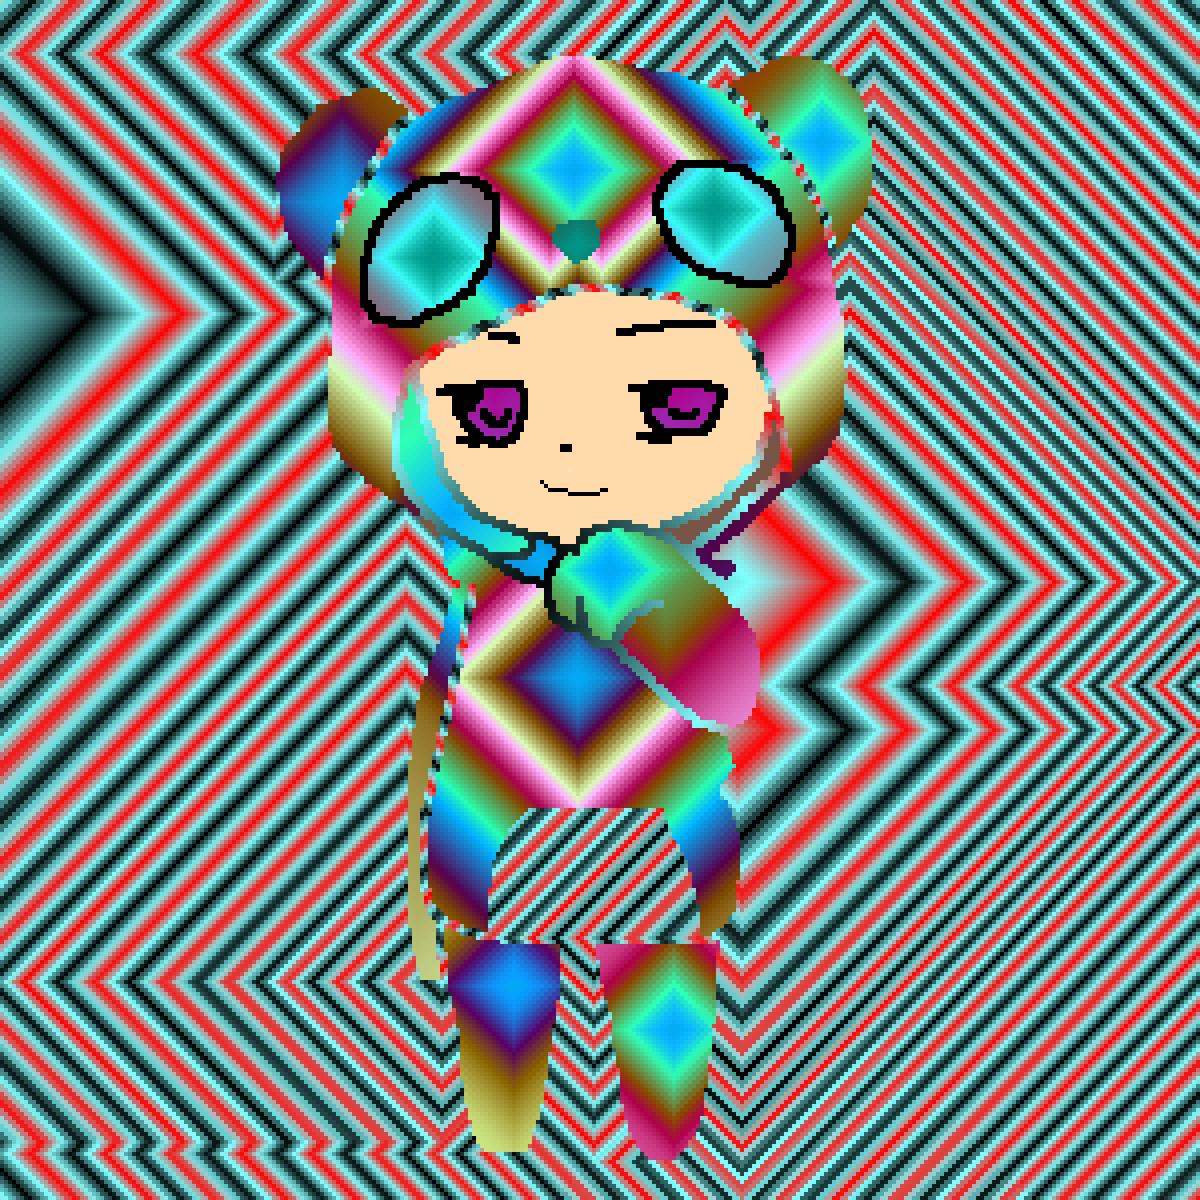 Rainbow Girl #2 by Oliviaolivia